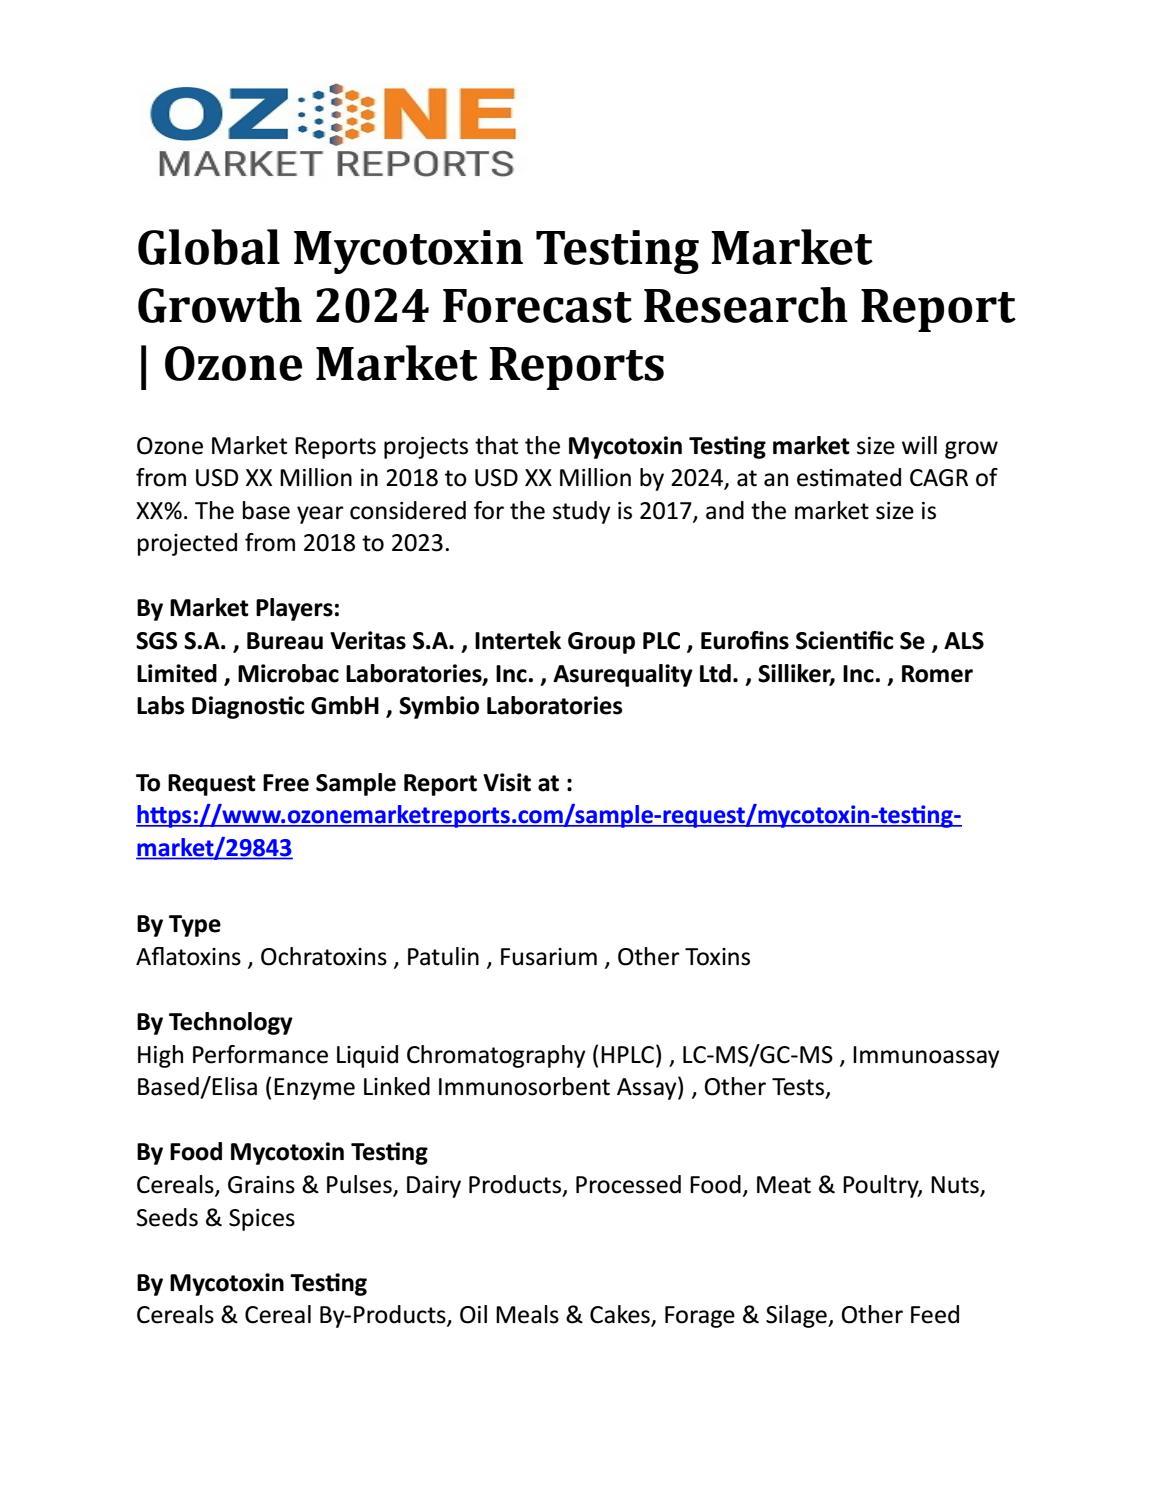 Global Mycotoxin Testing Market Growth 2024 Forecast